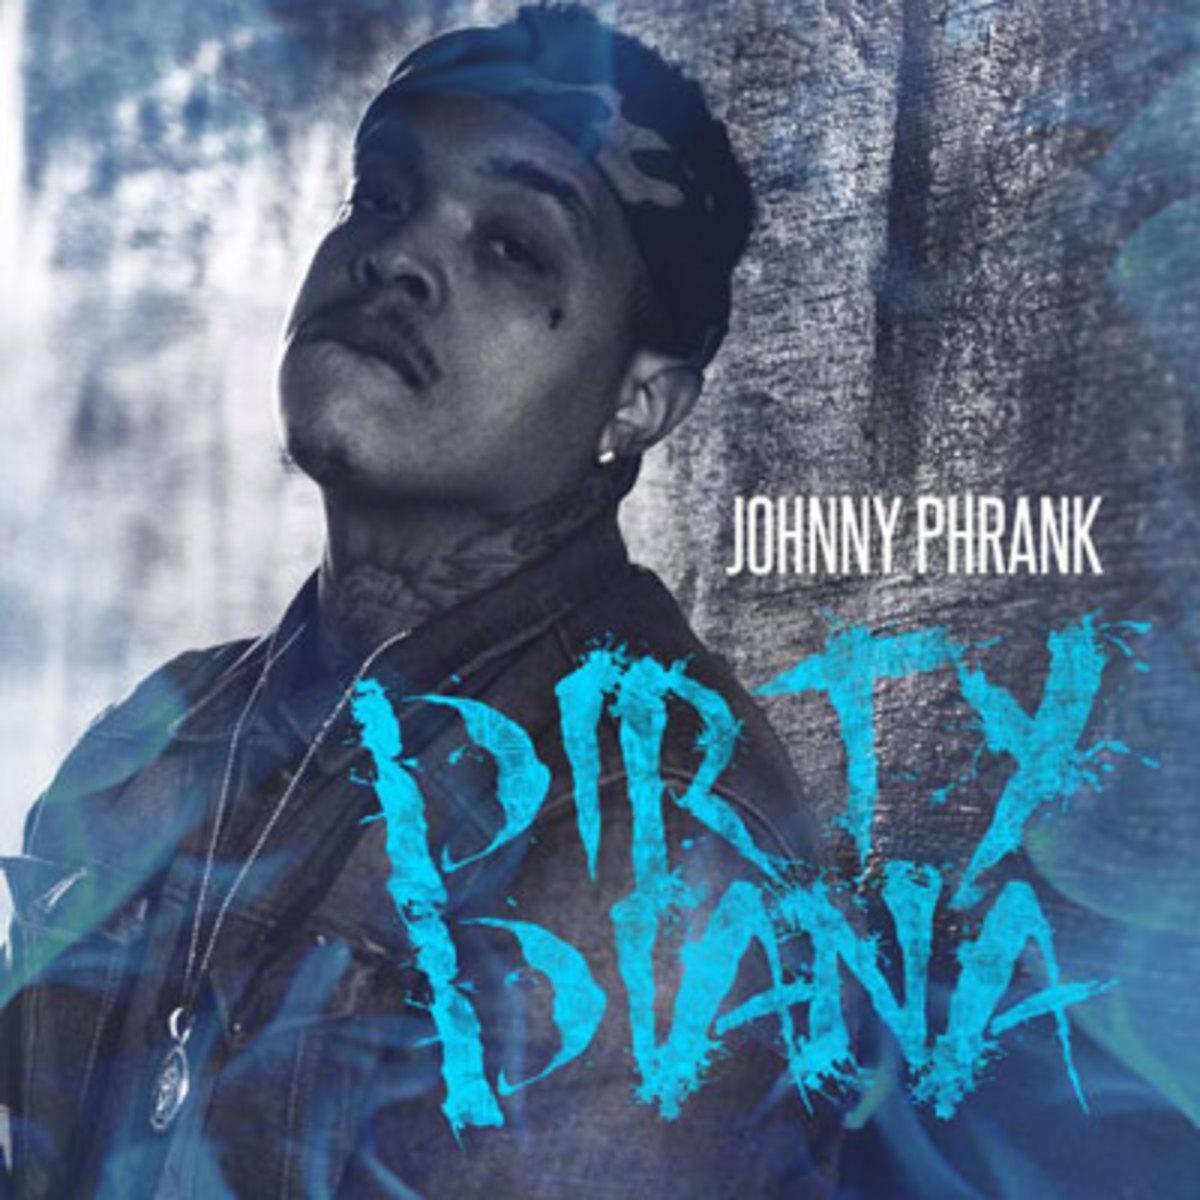 johnny-phrank-dirty-diana.jpg